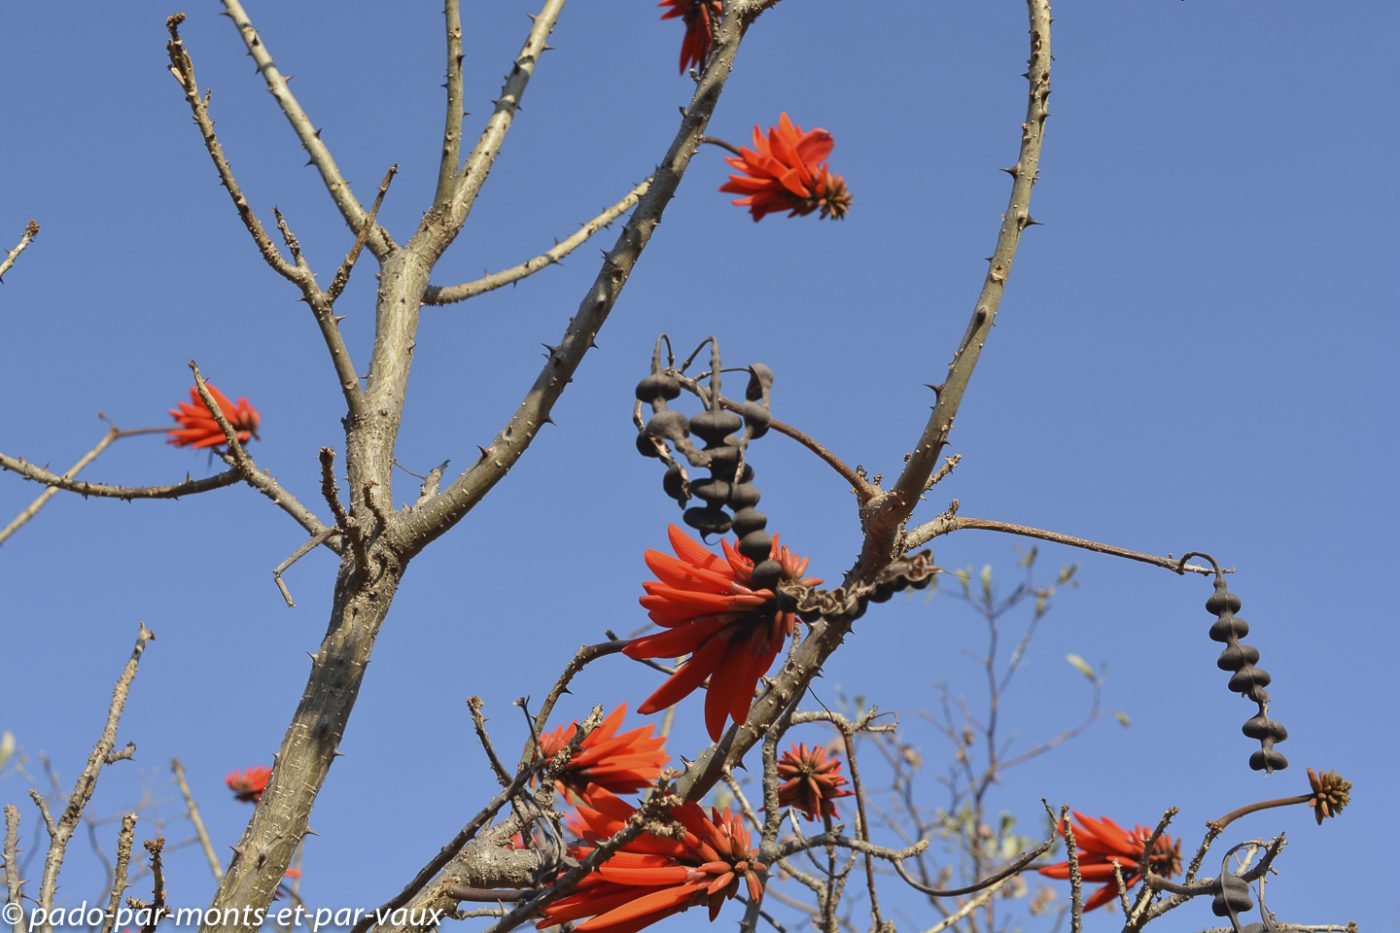 Iketla lodge - arbre corail